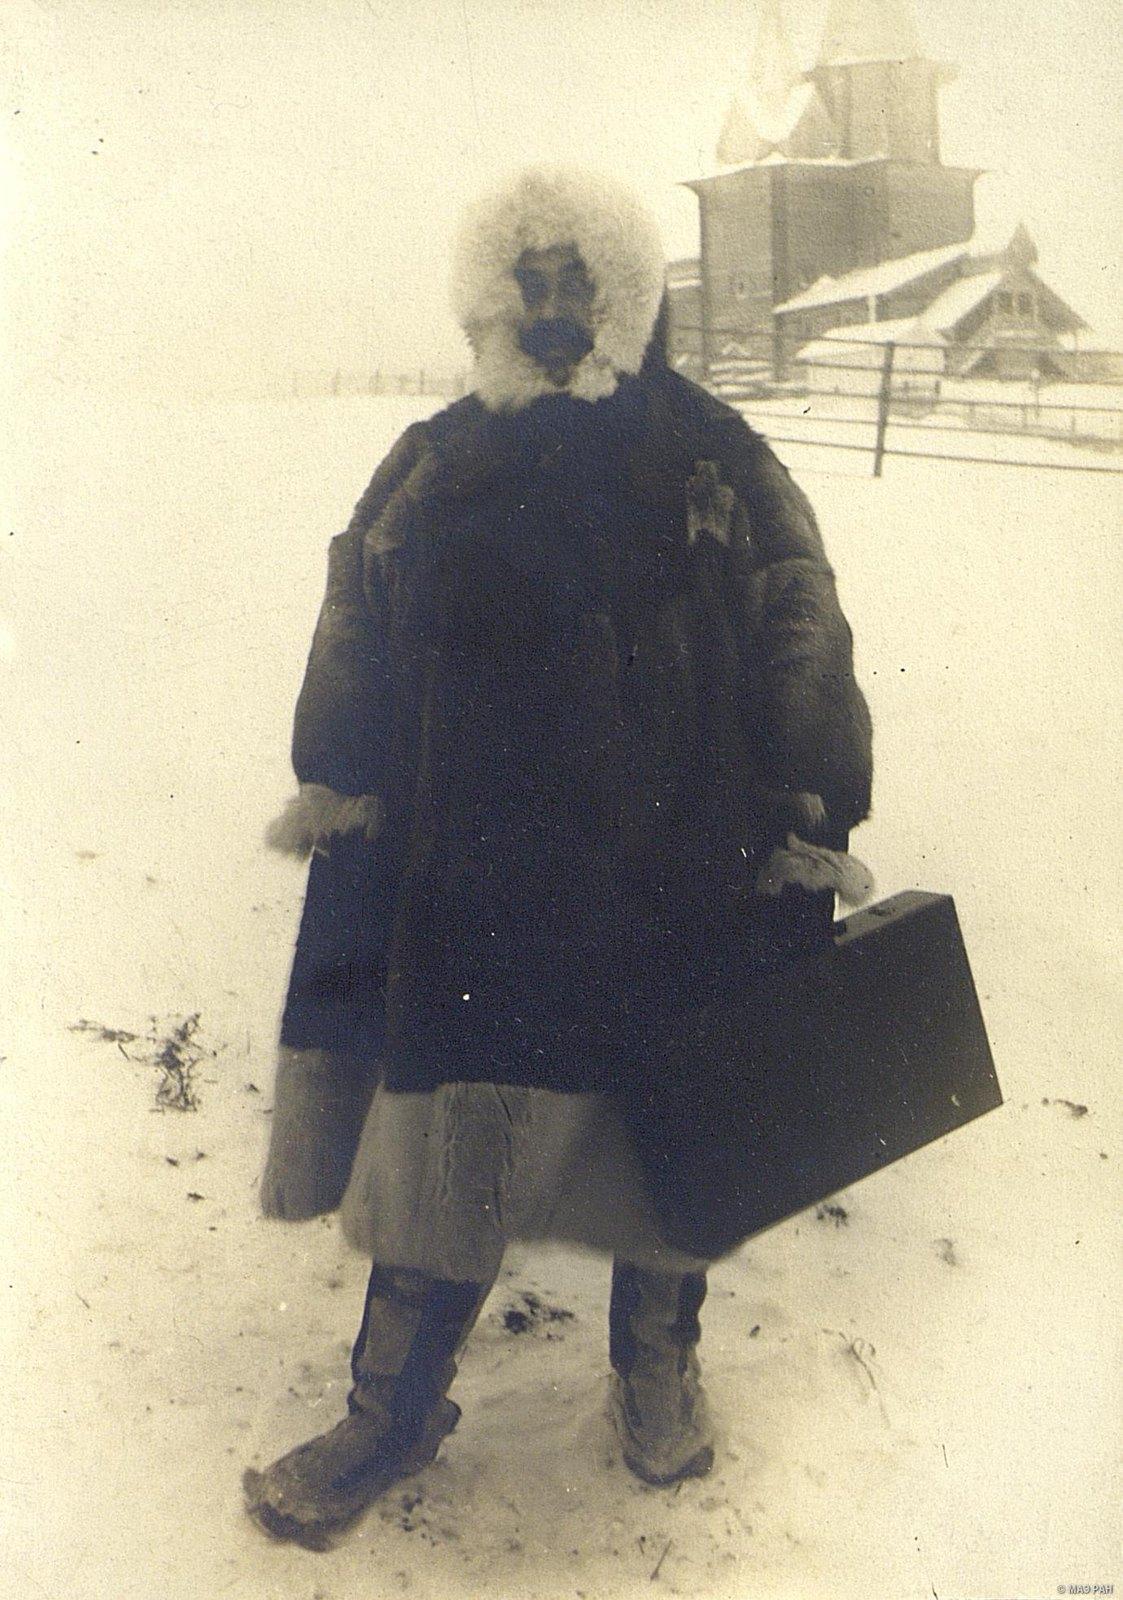 Николай Авенирович Шабунин в самоедском костюме